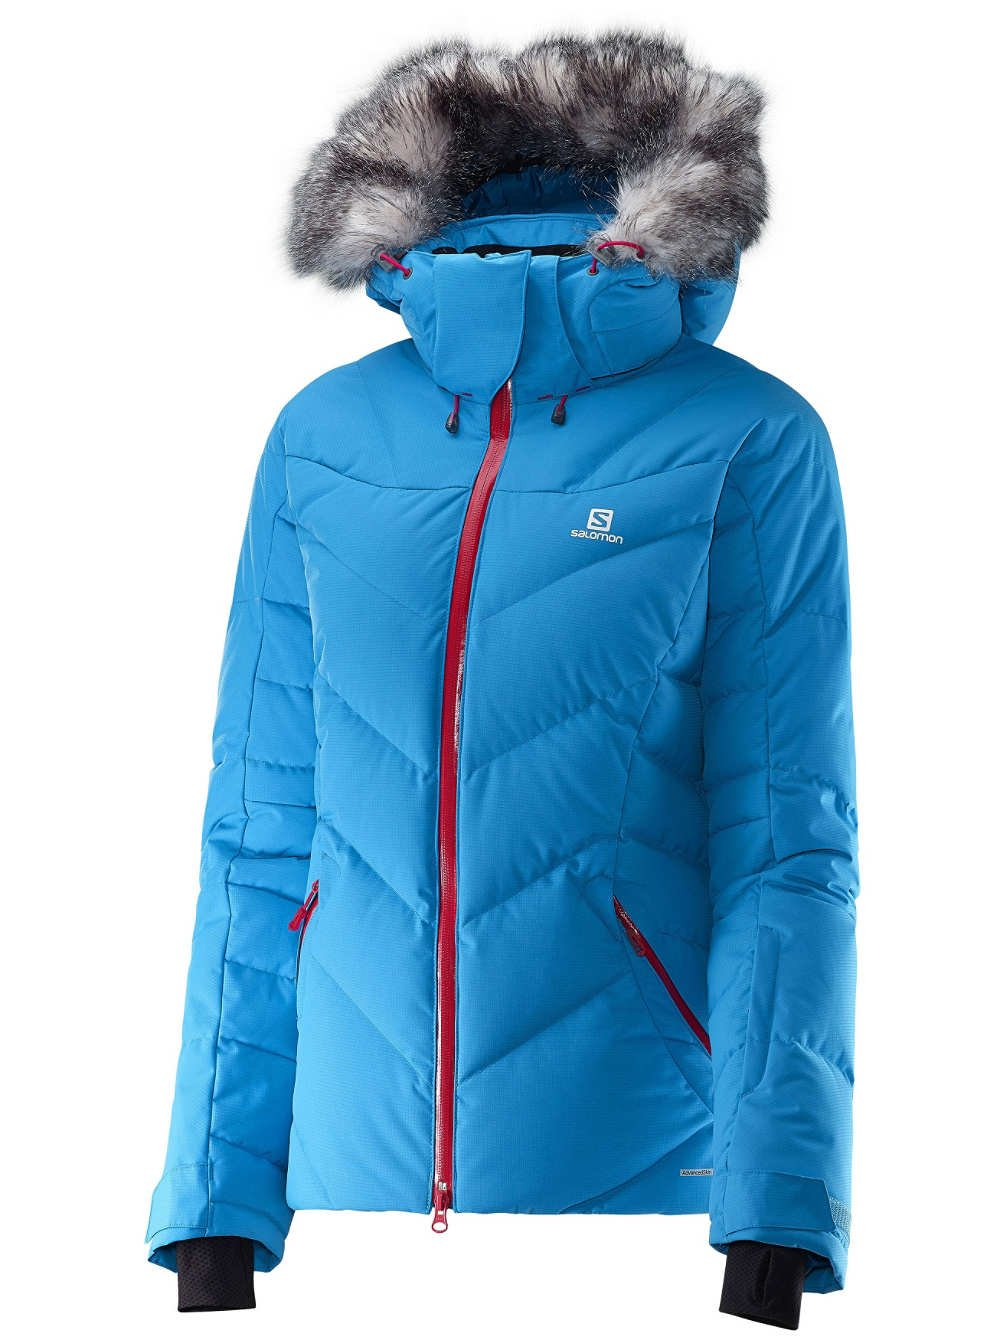 Damen Snowboard Jacke Salomon Icetown Jacket kaufen